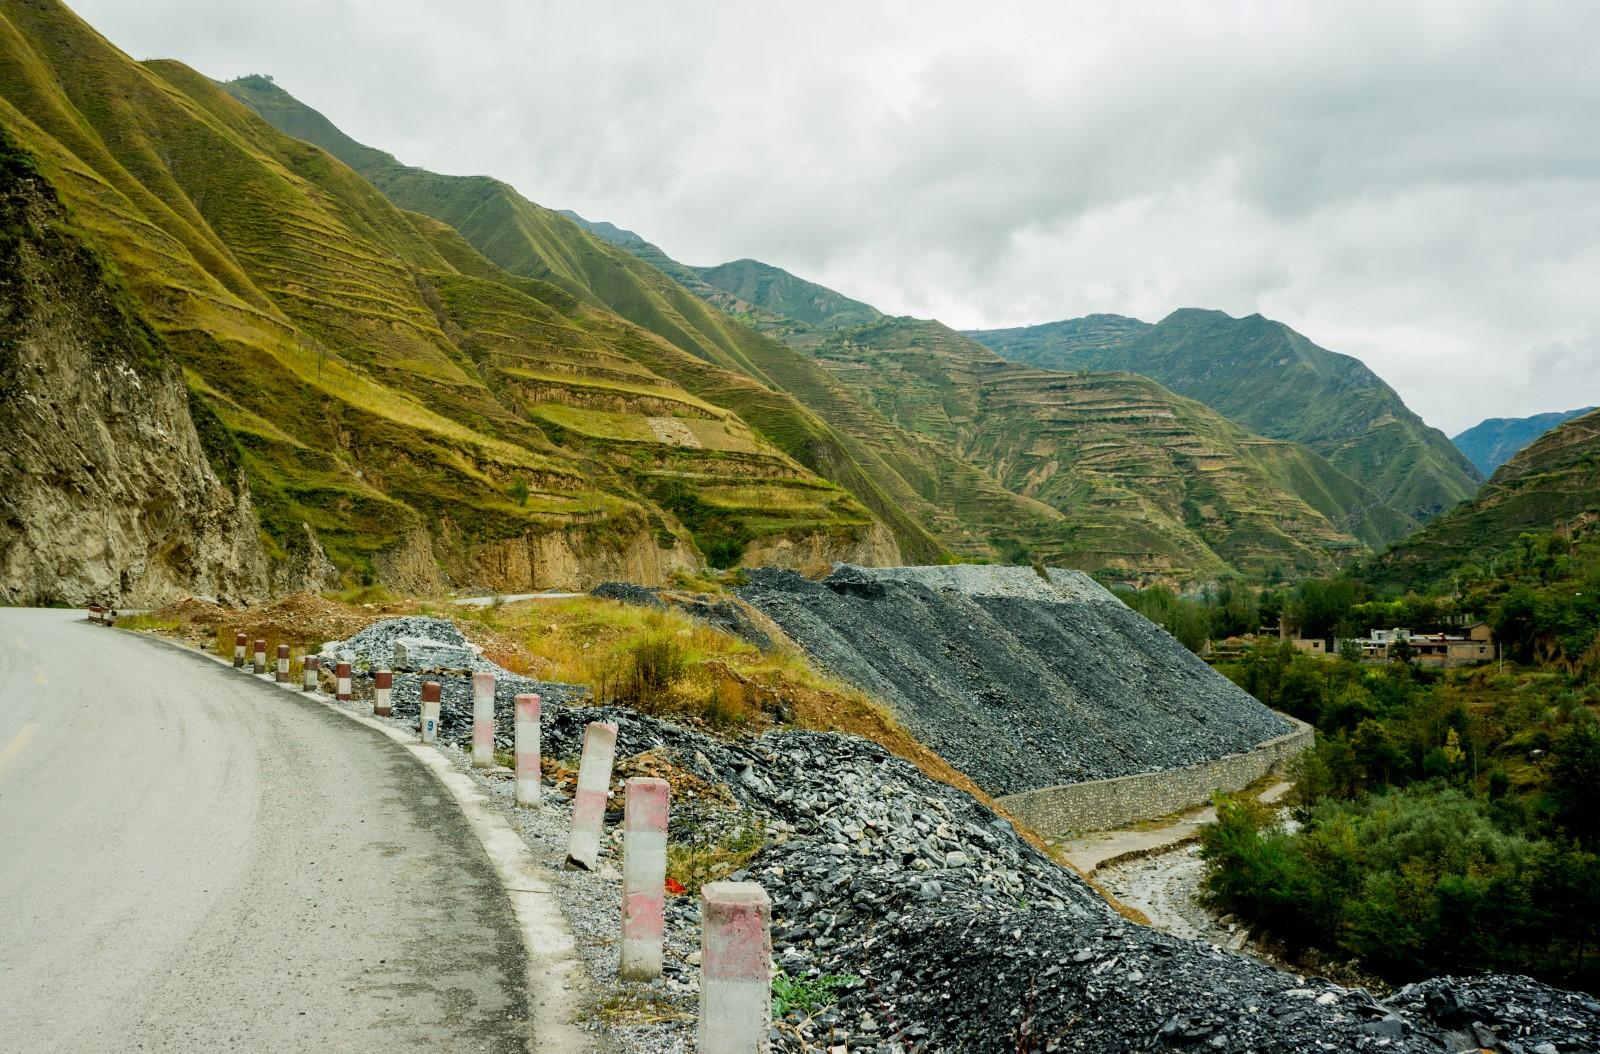 Chiny_budowa_drogi